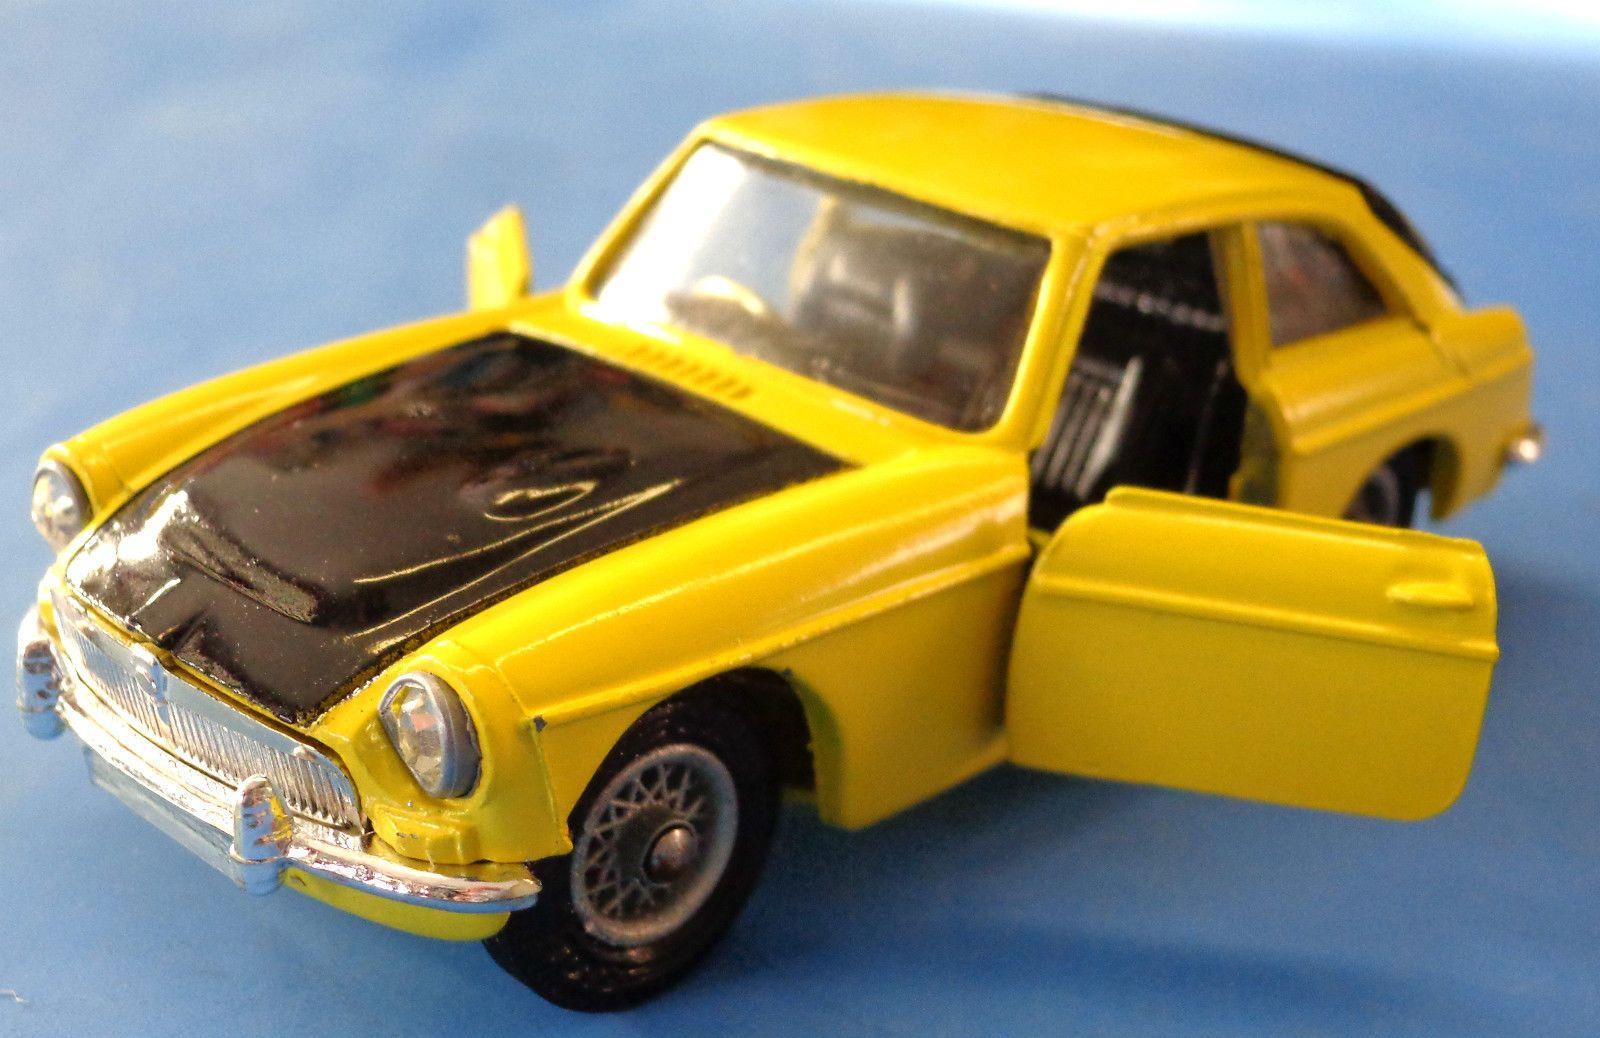 Mgc gt competition model diecast toy car by corgi mib w